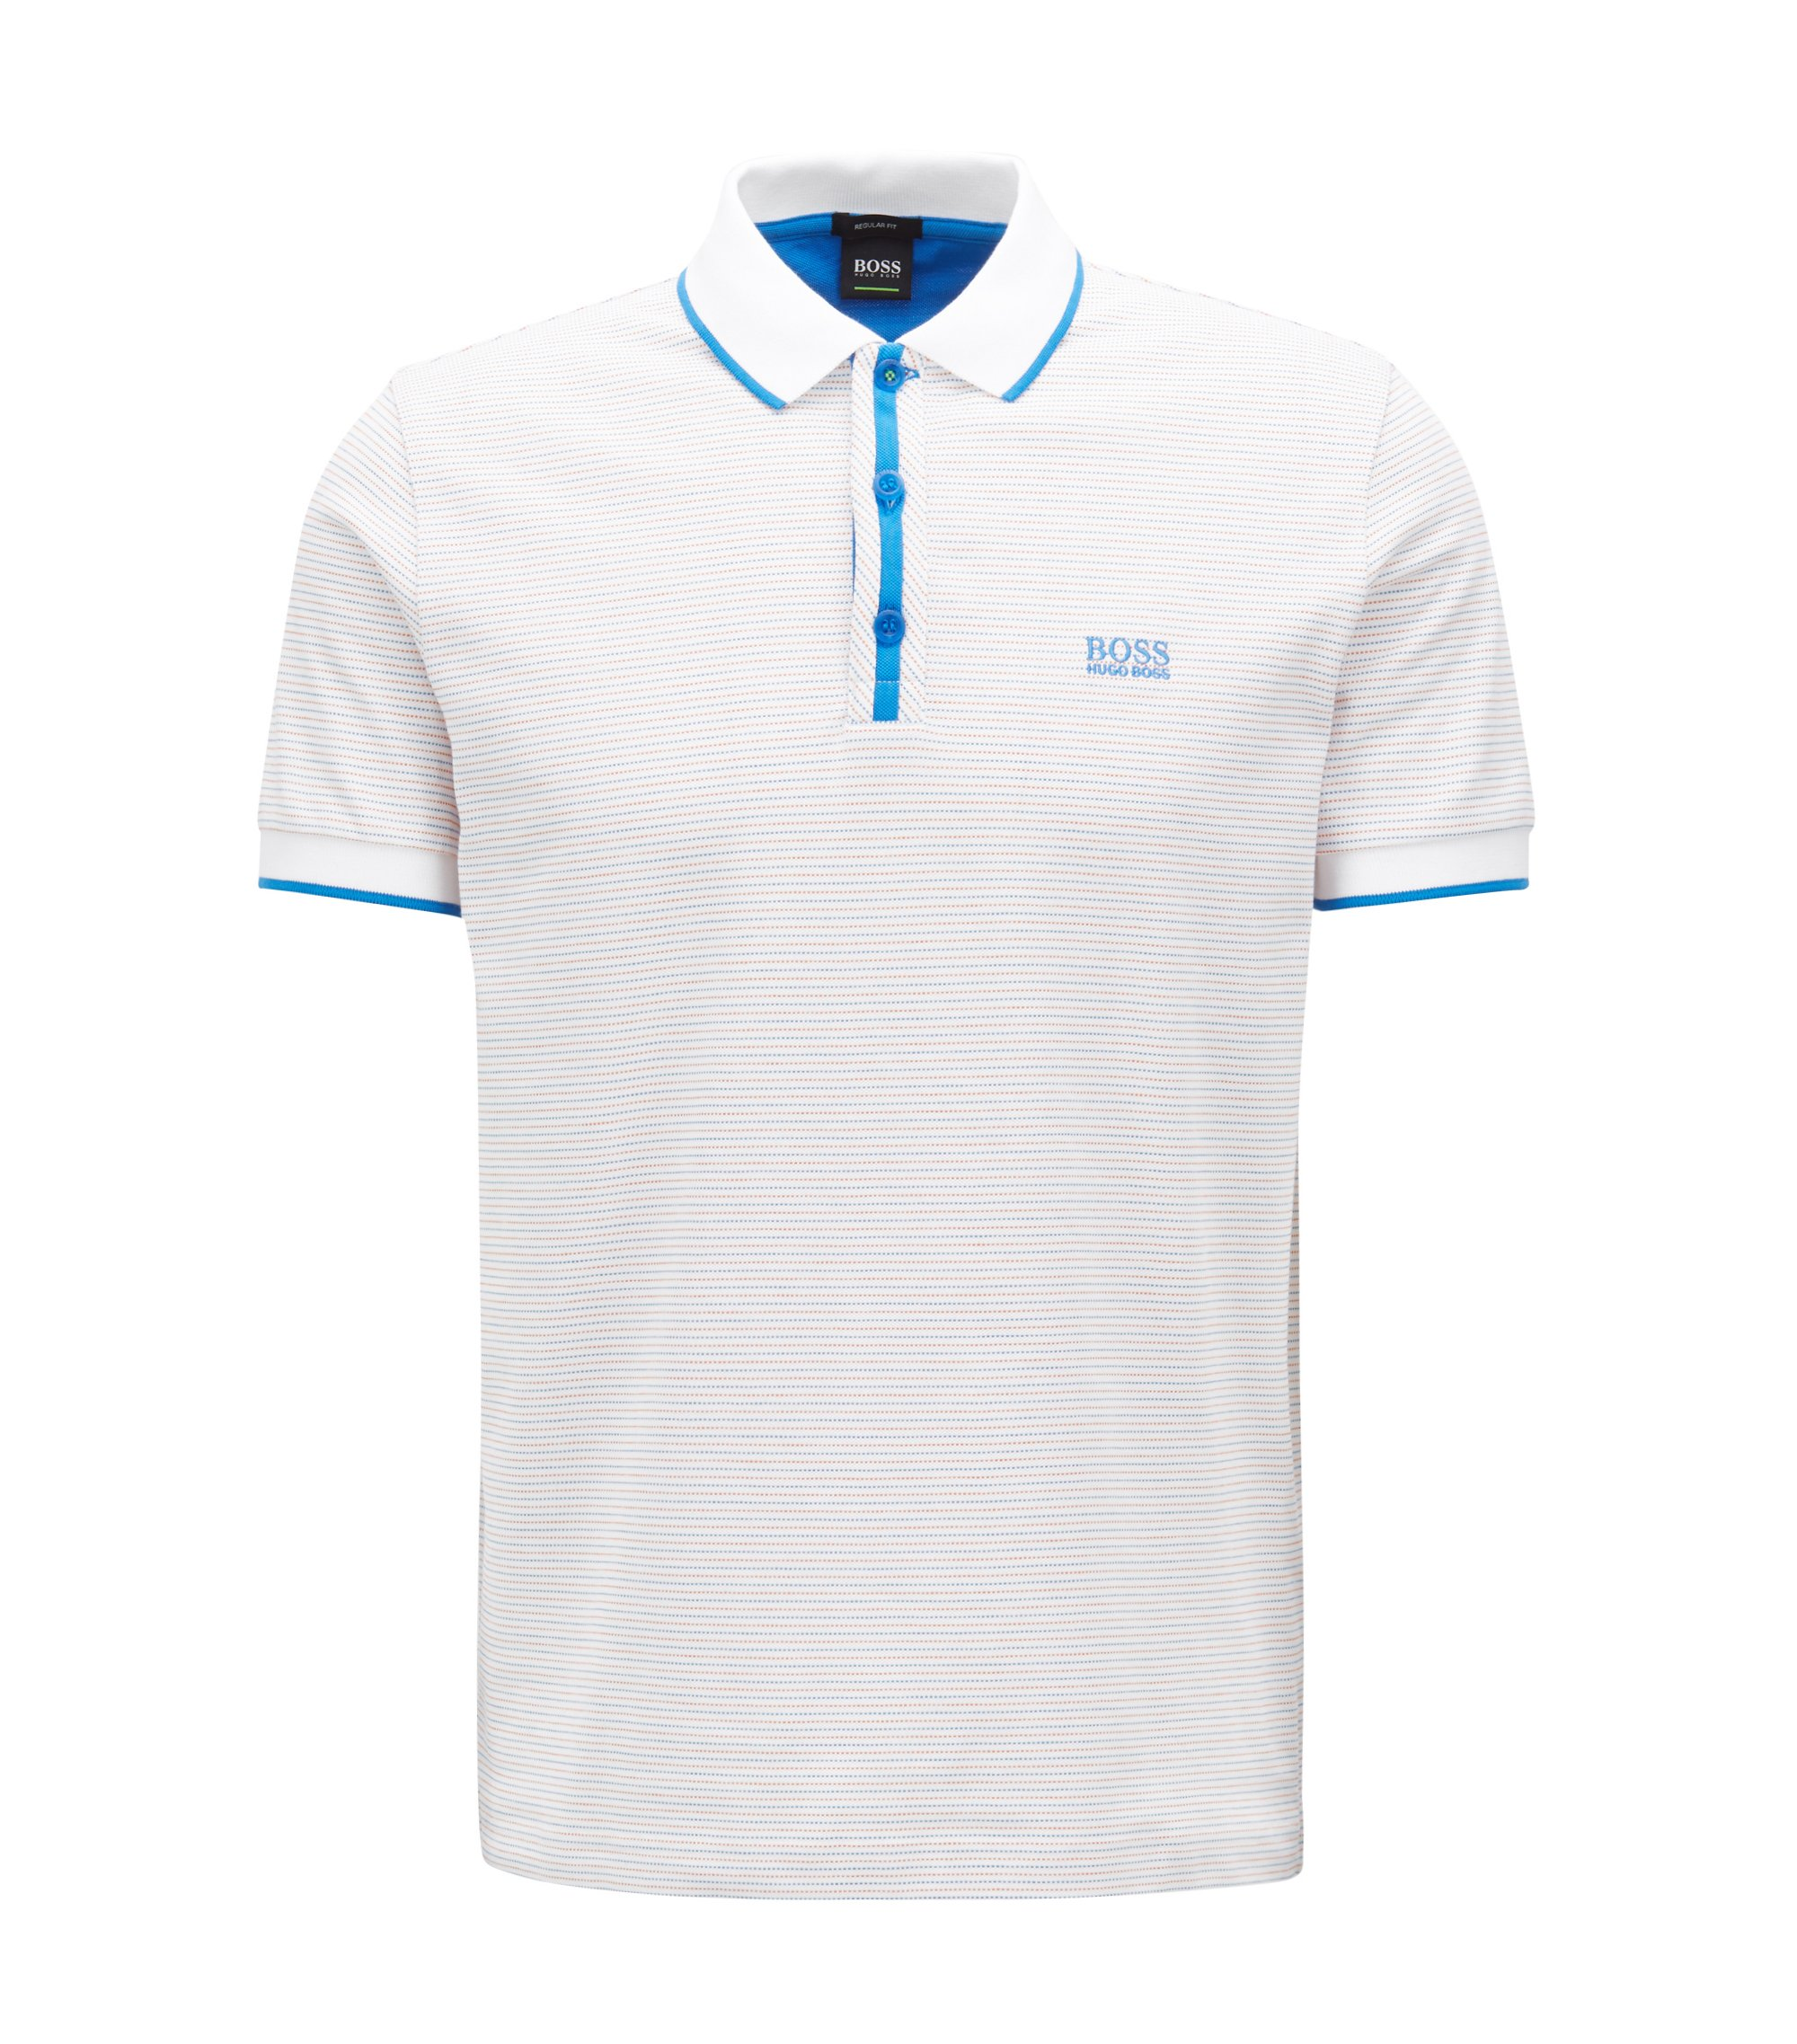 Poloshirt aus gepunktetem Baumwoll-Jacquard, Weiß